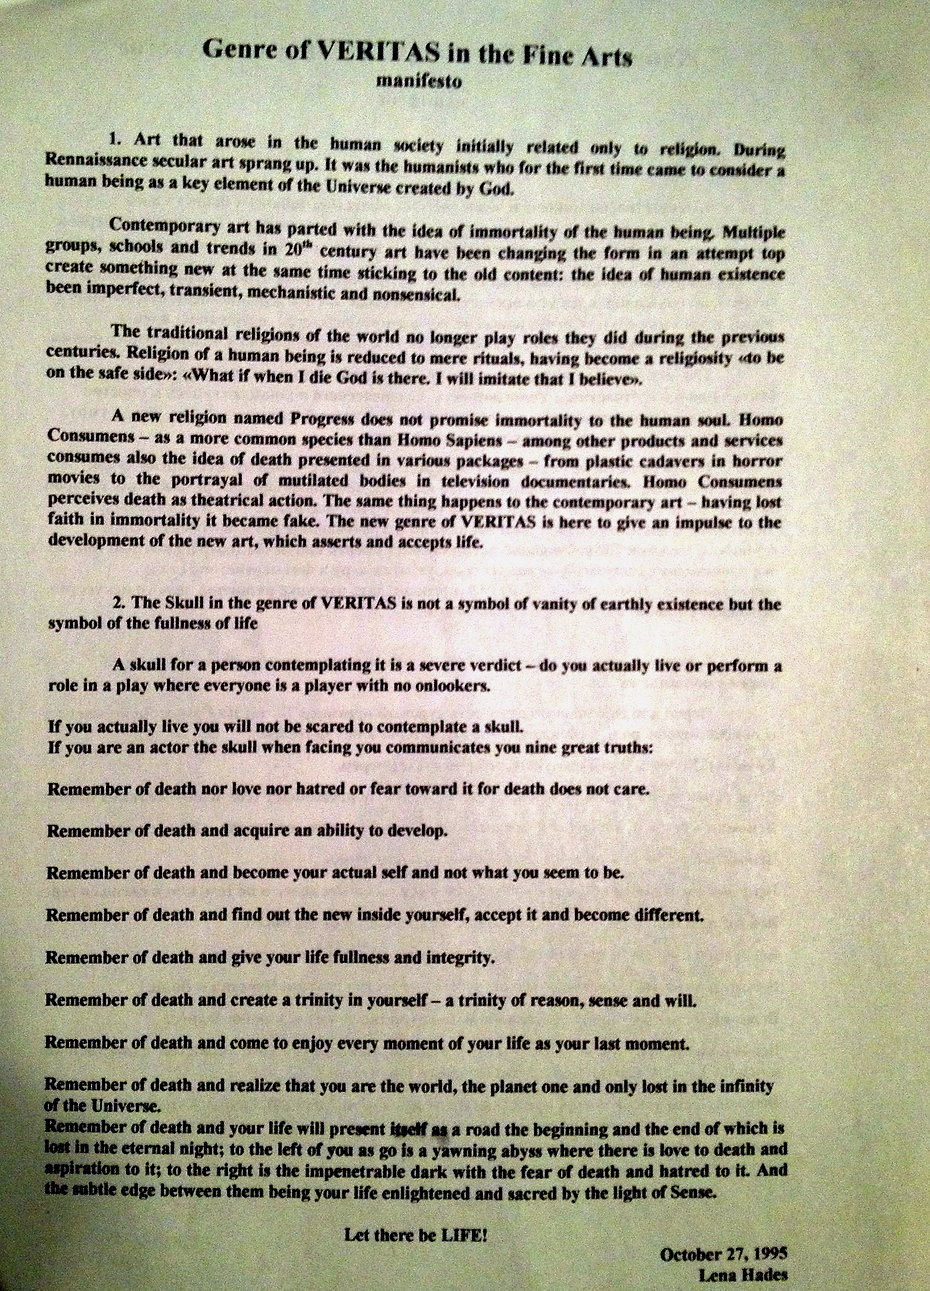 Manifesto Veritas 1995